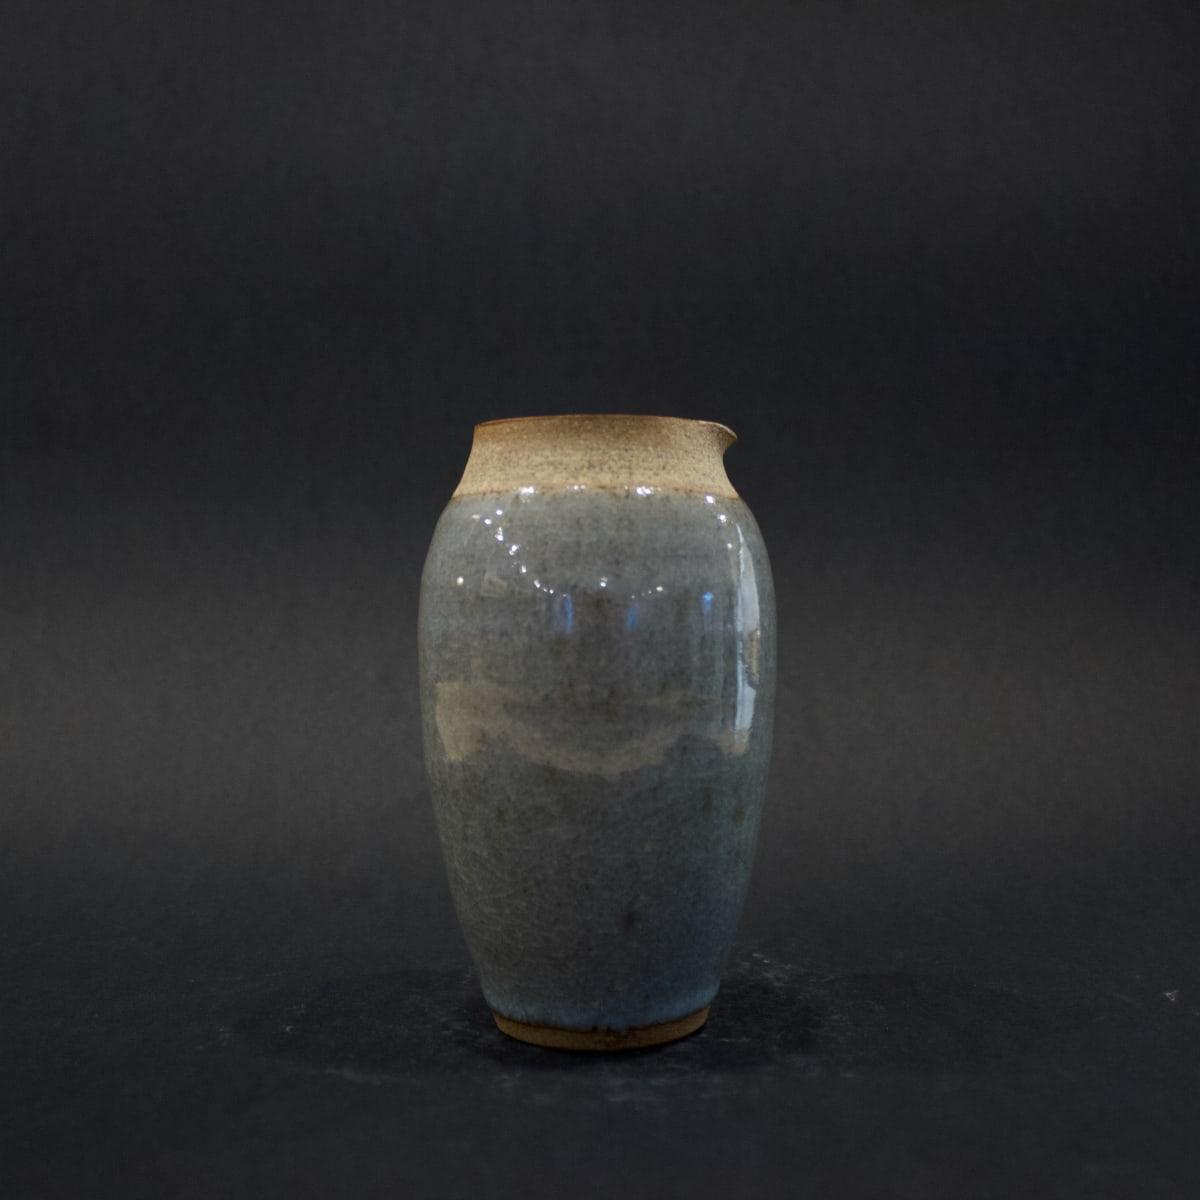 Kate Garwood Chun Jug, 2019 Ceramic 10 x 7.5 x 7.5 cm 3 1/2 x 3 x 3 in